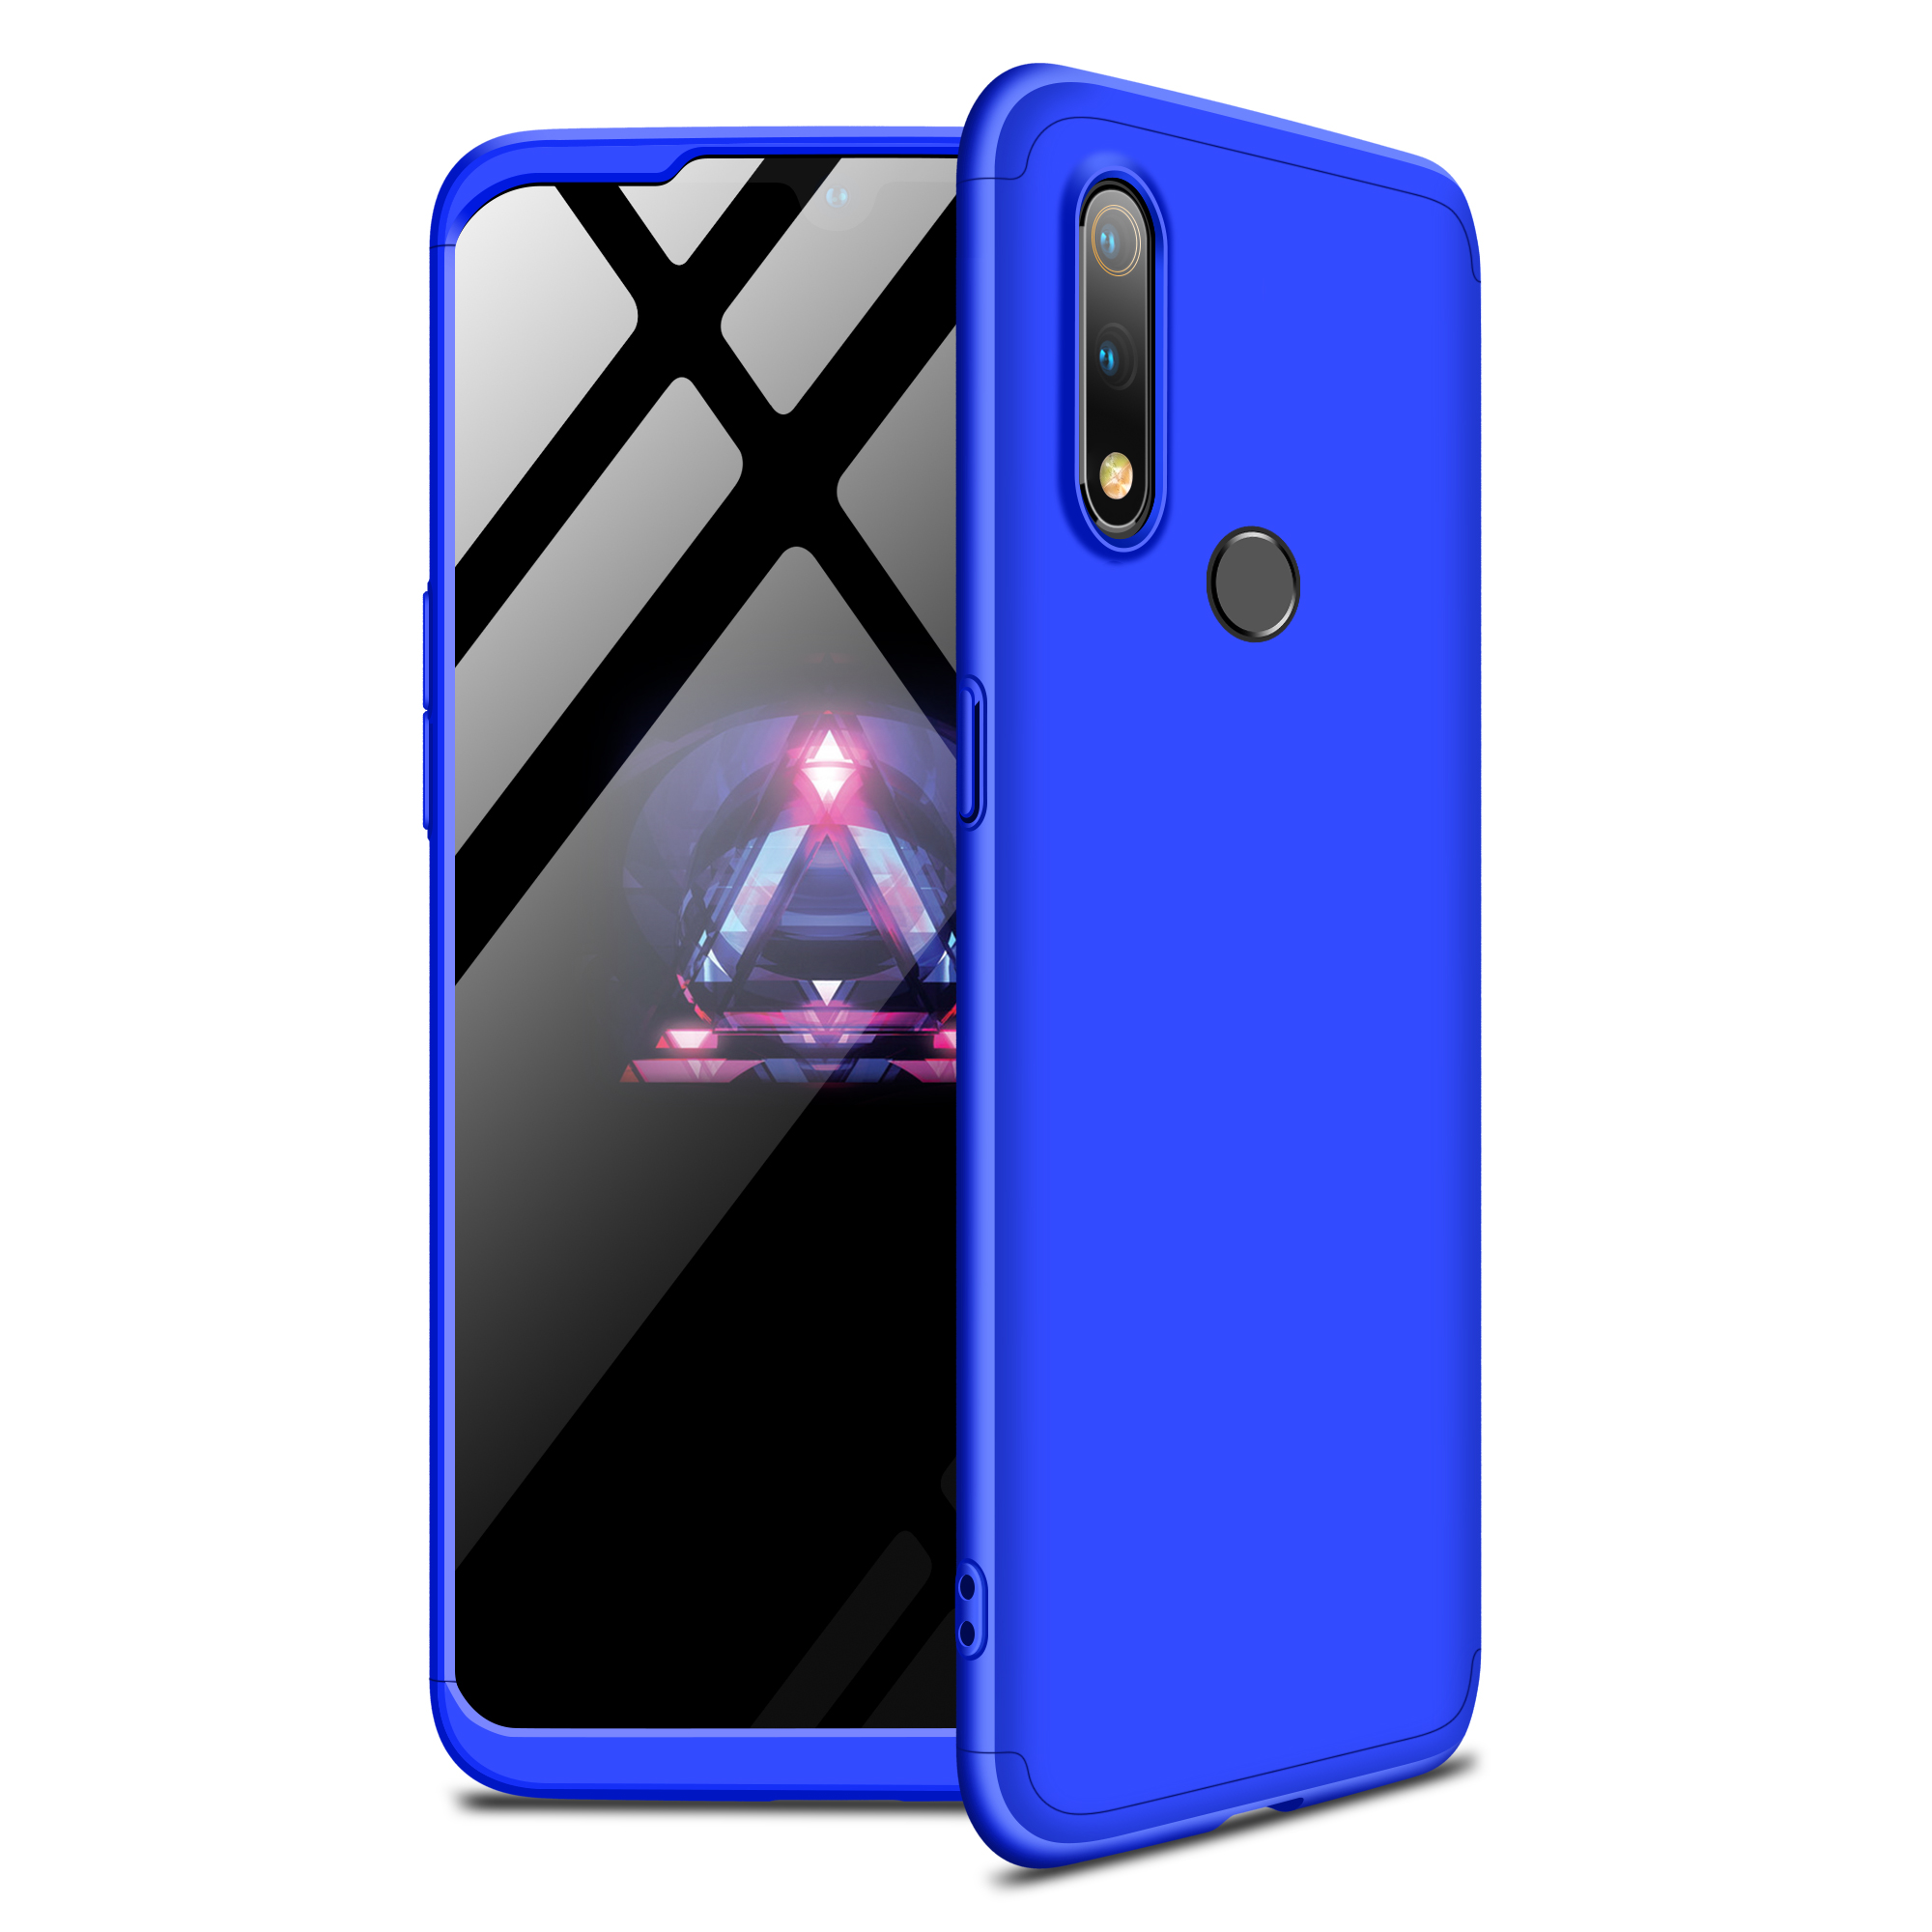 For Oppo Realme 3 pro Ultra Slim PC Back Cover Non-slip Shockproof 360 Degree Full Protective Case blue